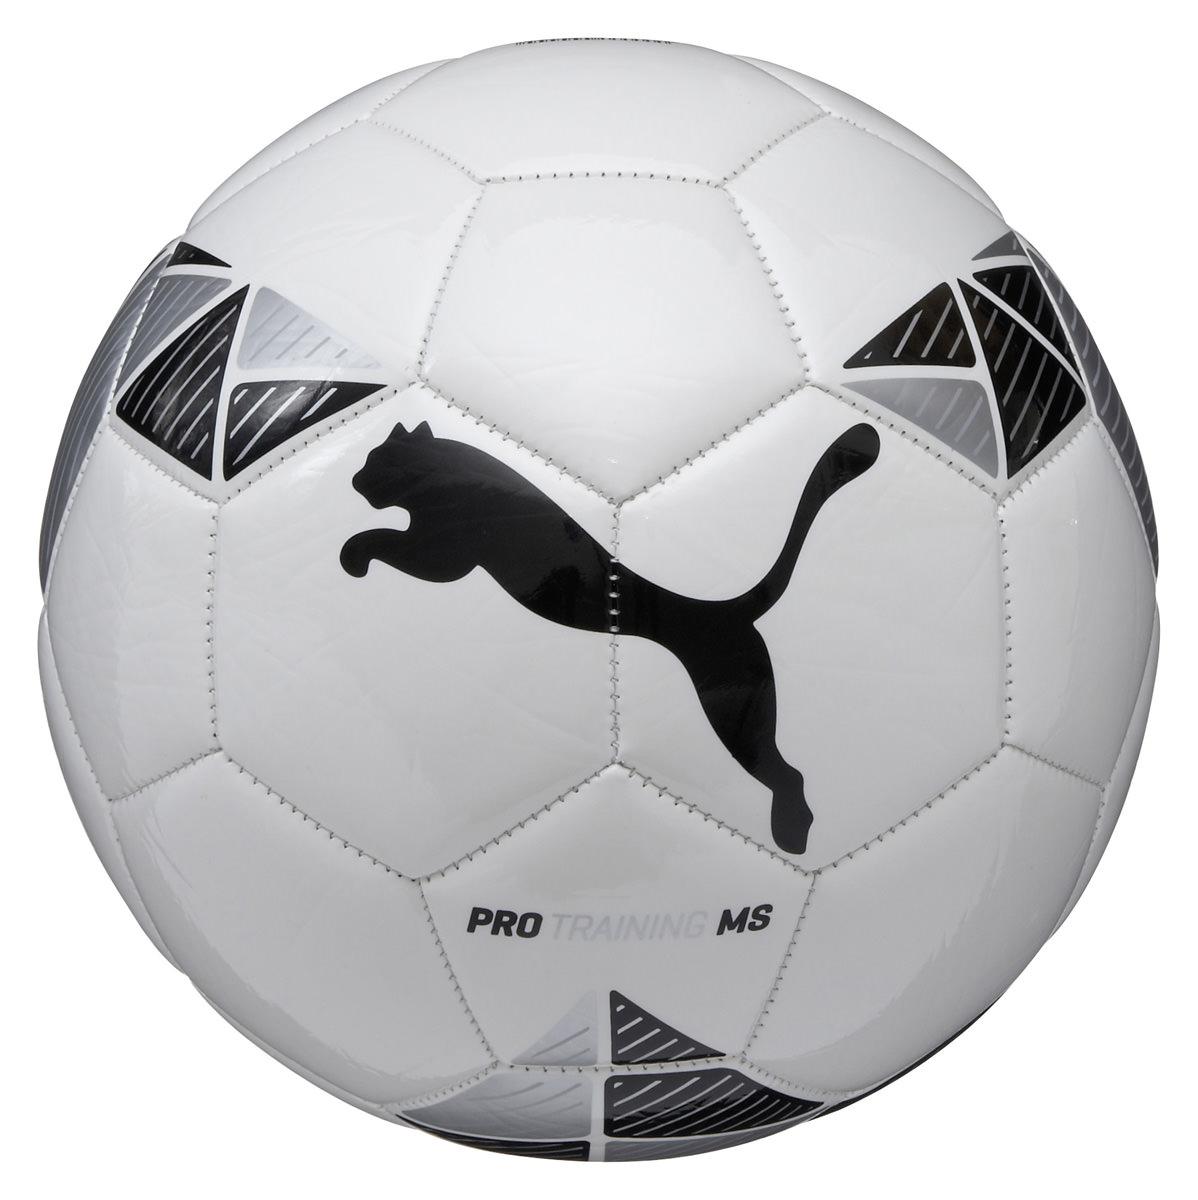 Puma Pro Training MS Football - White-Black